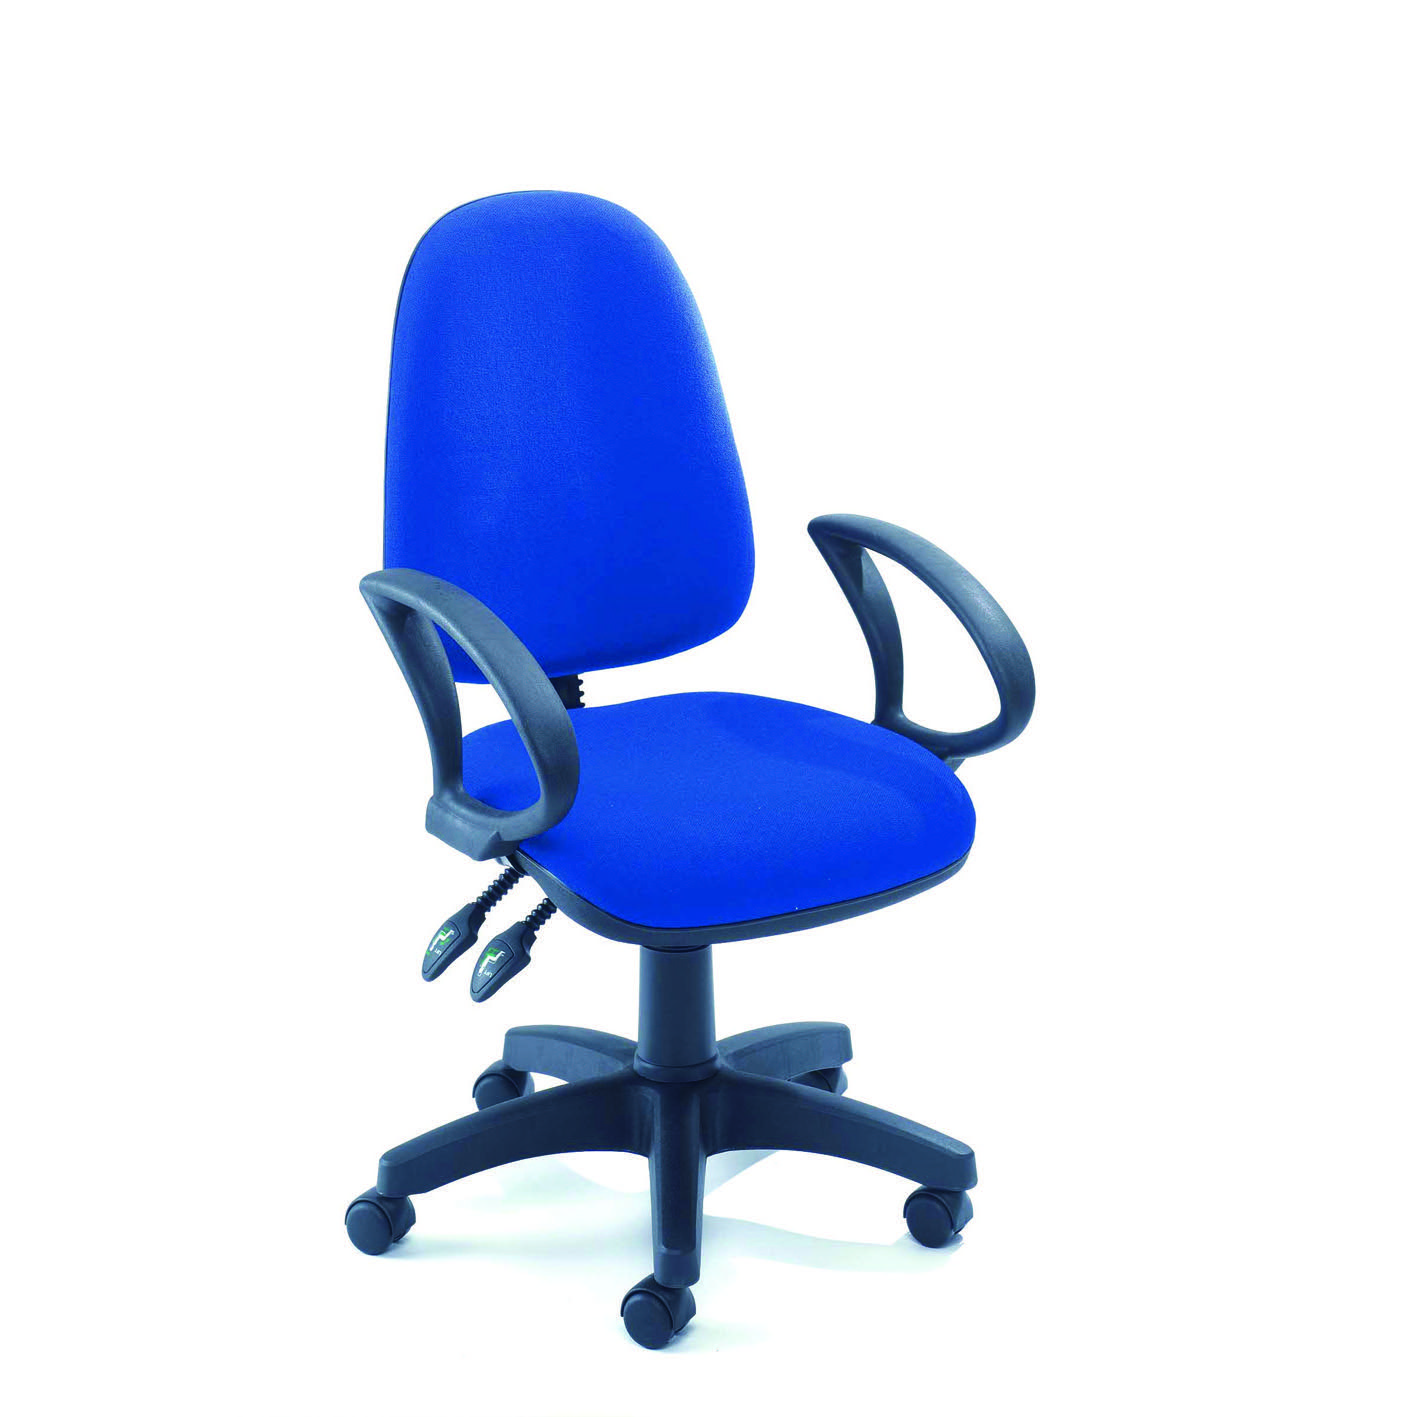 Initiative High Back Tilt Chair Royal Blue